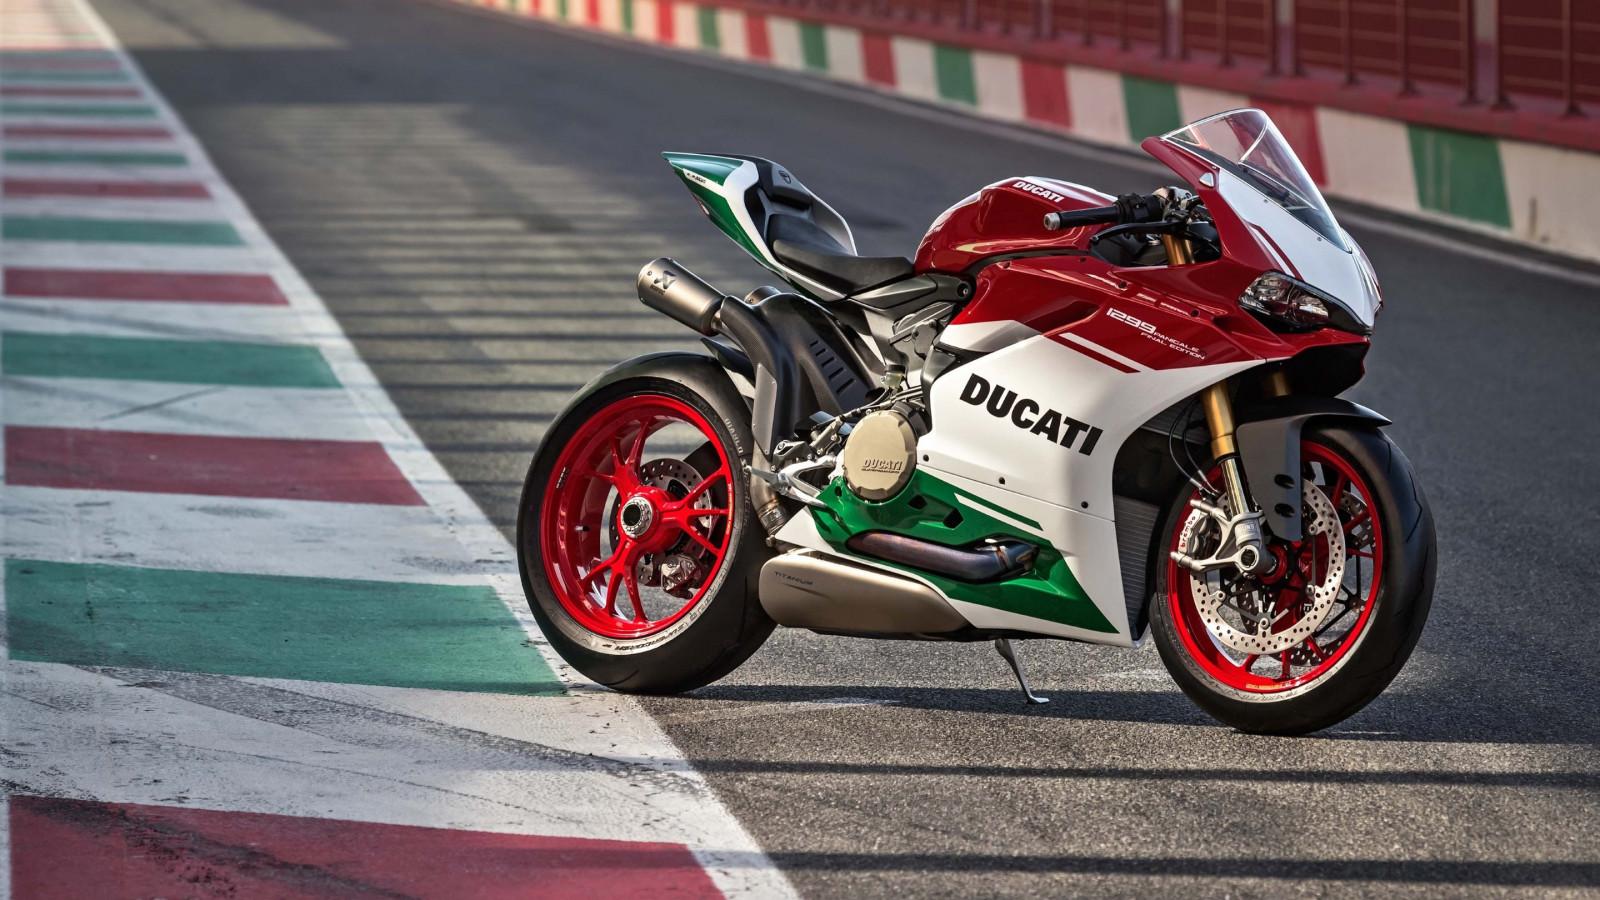 Download wallpaper Ducati 1299 Panigale R 1600x900 1600x900